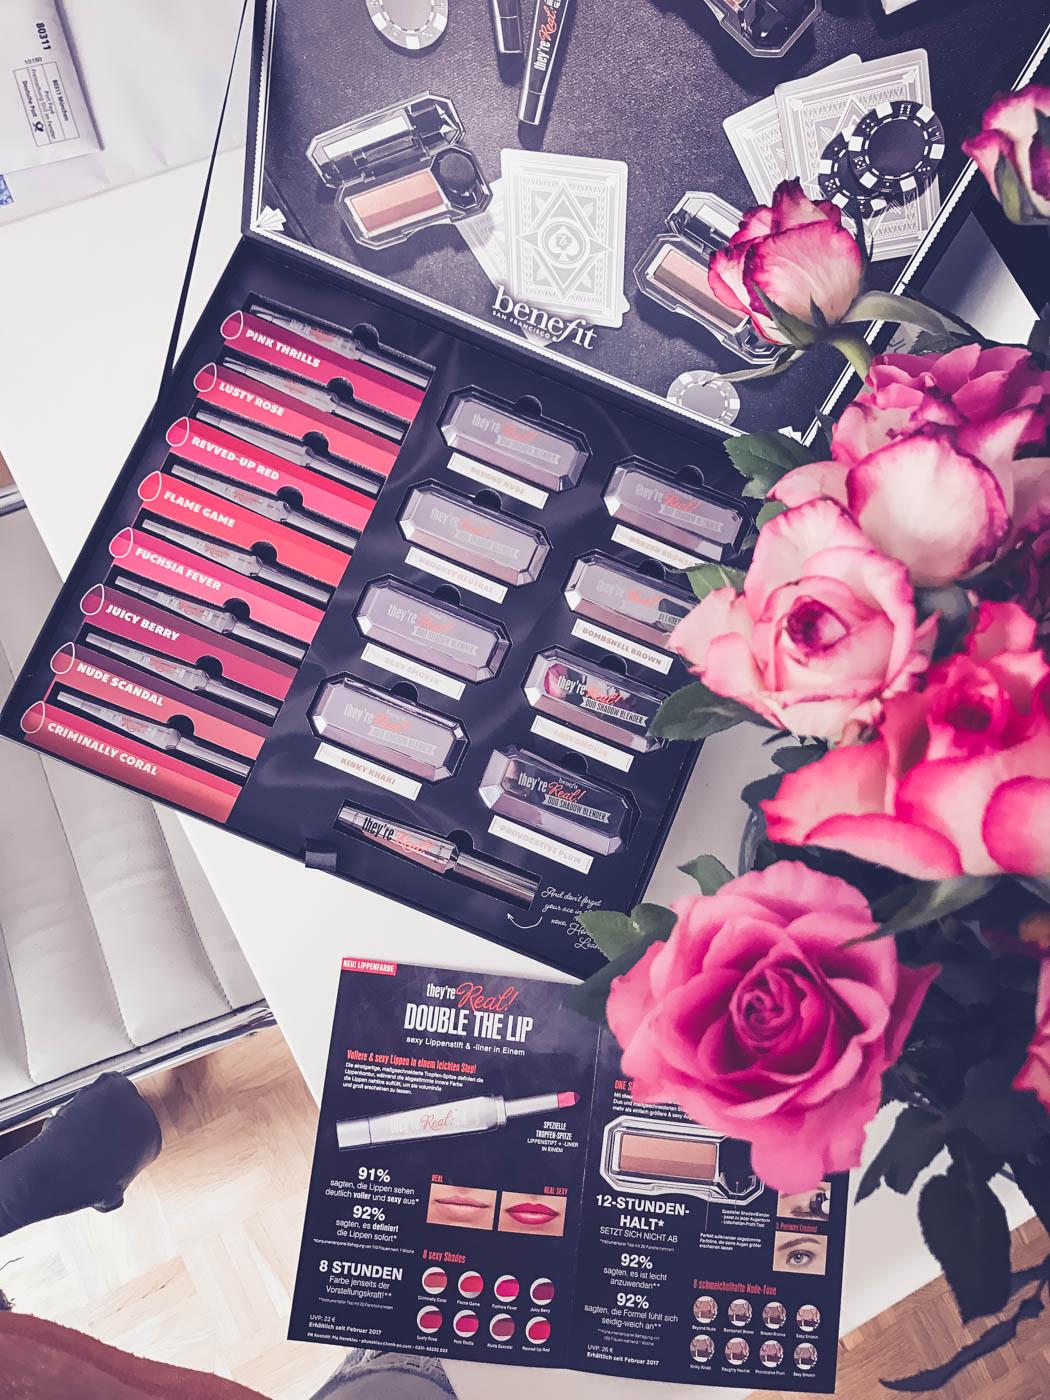 Benefit-Kit-Double-the-lip-Lippenstift-Lipliner-Eyeshadow-Beautyblog-Beautyblogger-Beauty-Blog-Blogger-Linda-Lindarella-Muenchen-Deutschland